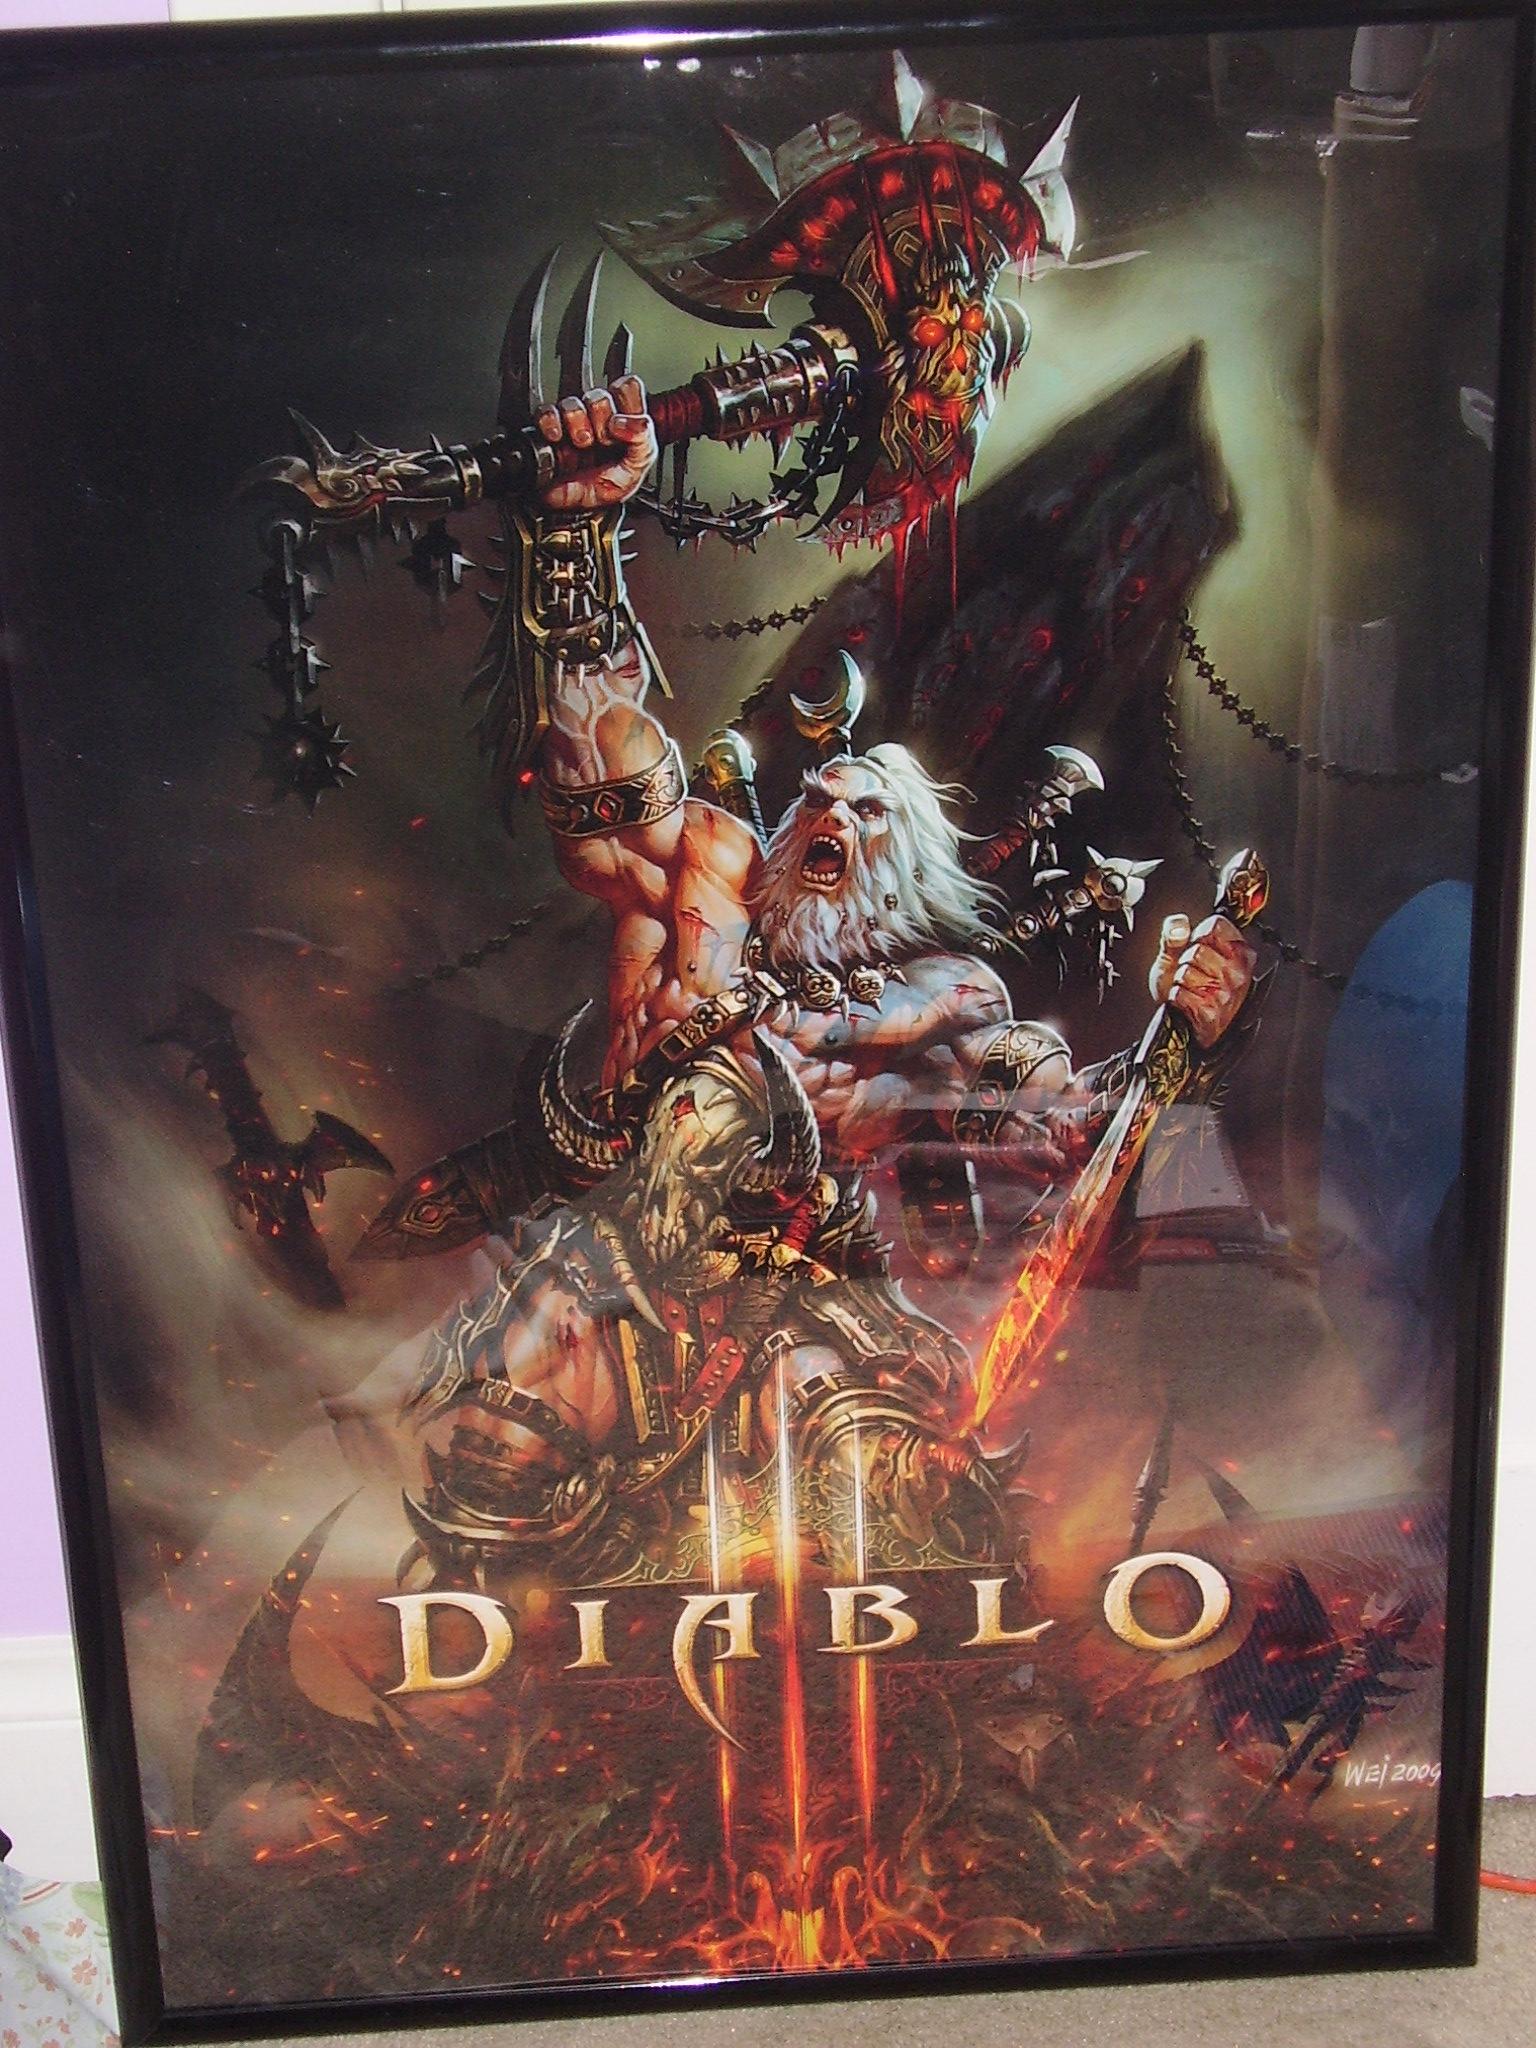 Diablo III - heroes Poster | Sold at Abposters.com  |Diablo Iii Poster